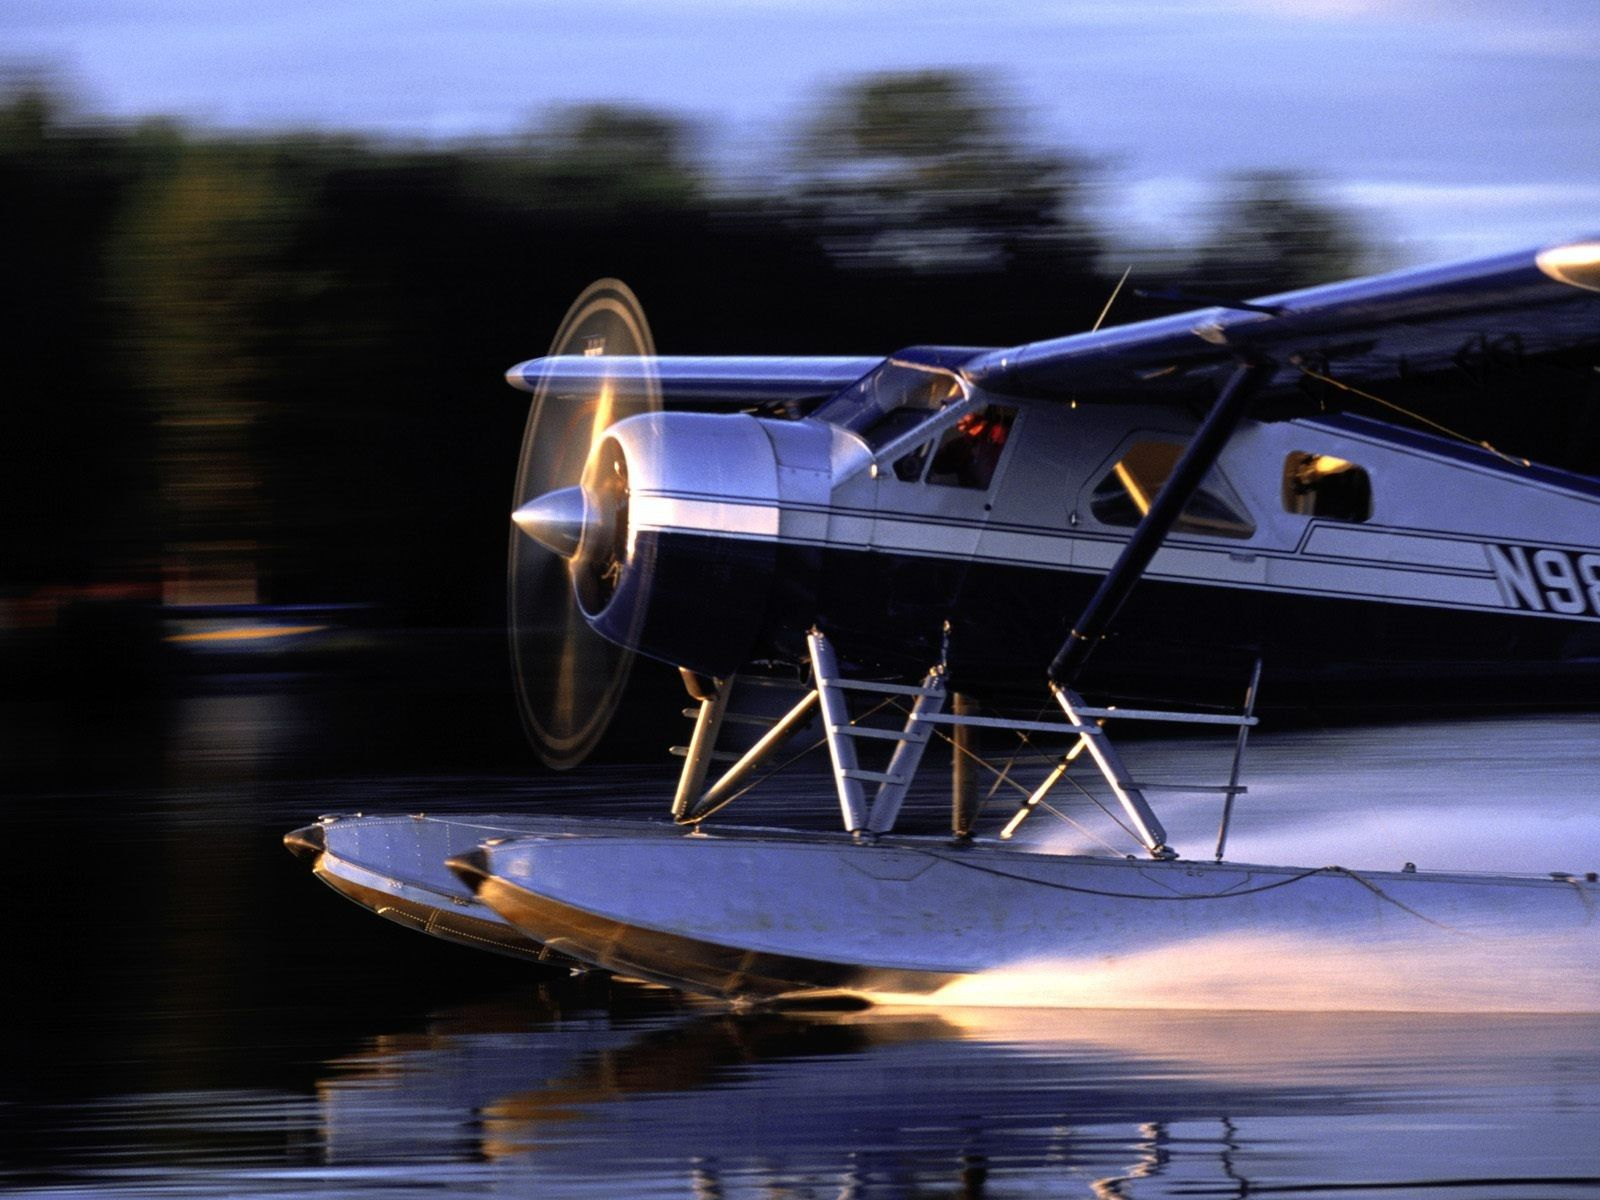 Alaska Wallpaper 1664416 Wallbase Cc Airplane Flying Boat Airplane Photography